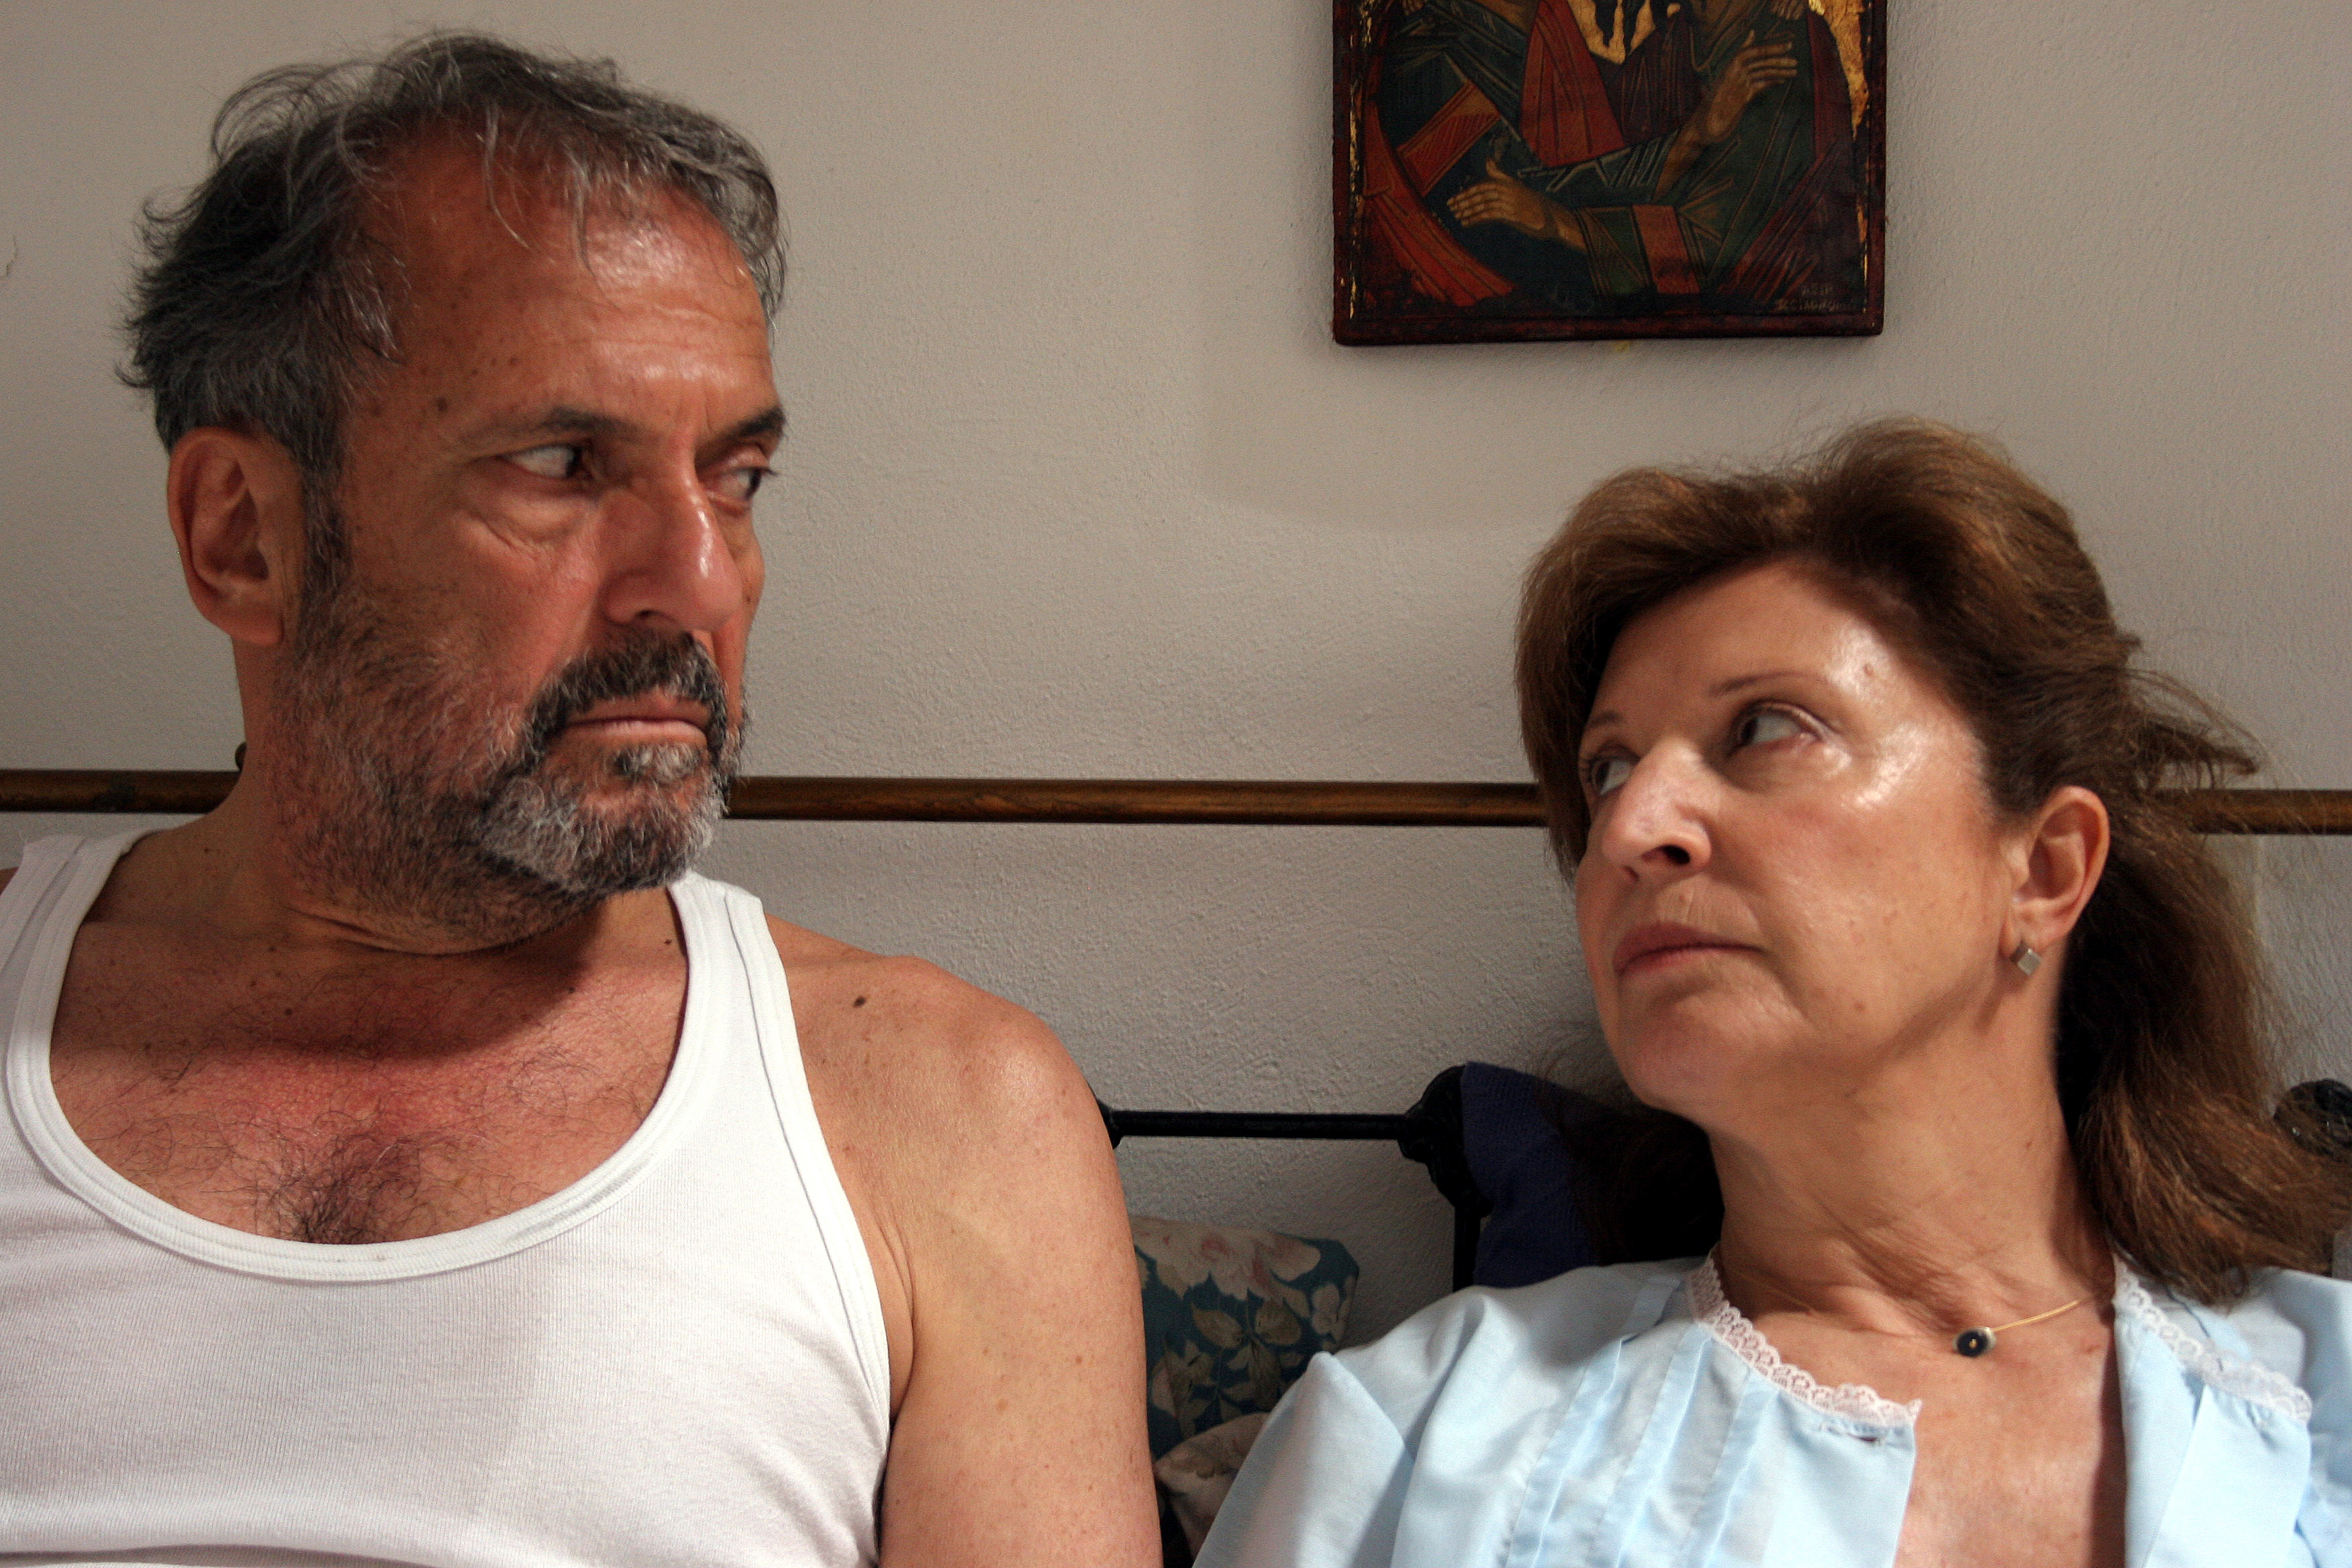 Minas Hatzisavvas and Sofia Seirli in Amyna zonis (2007)